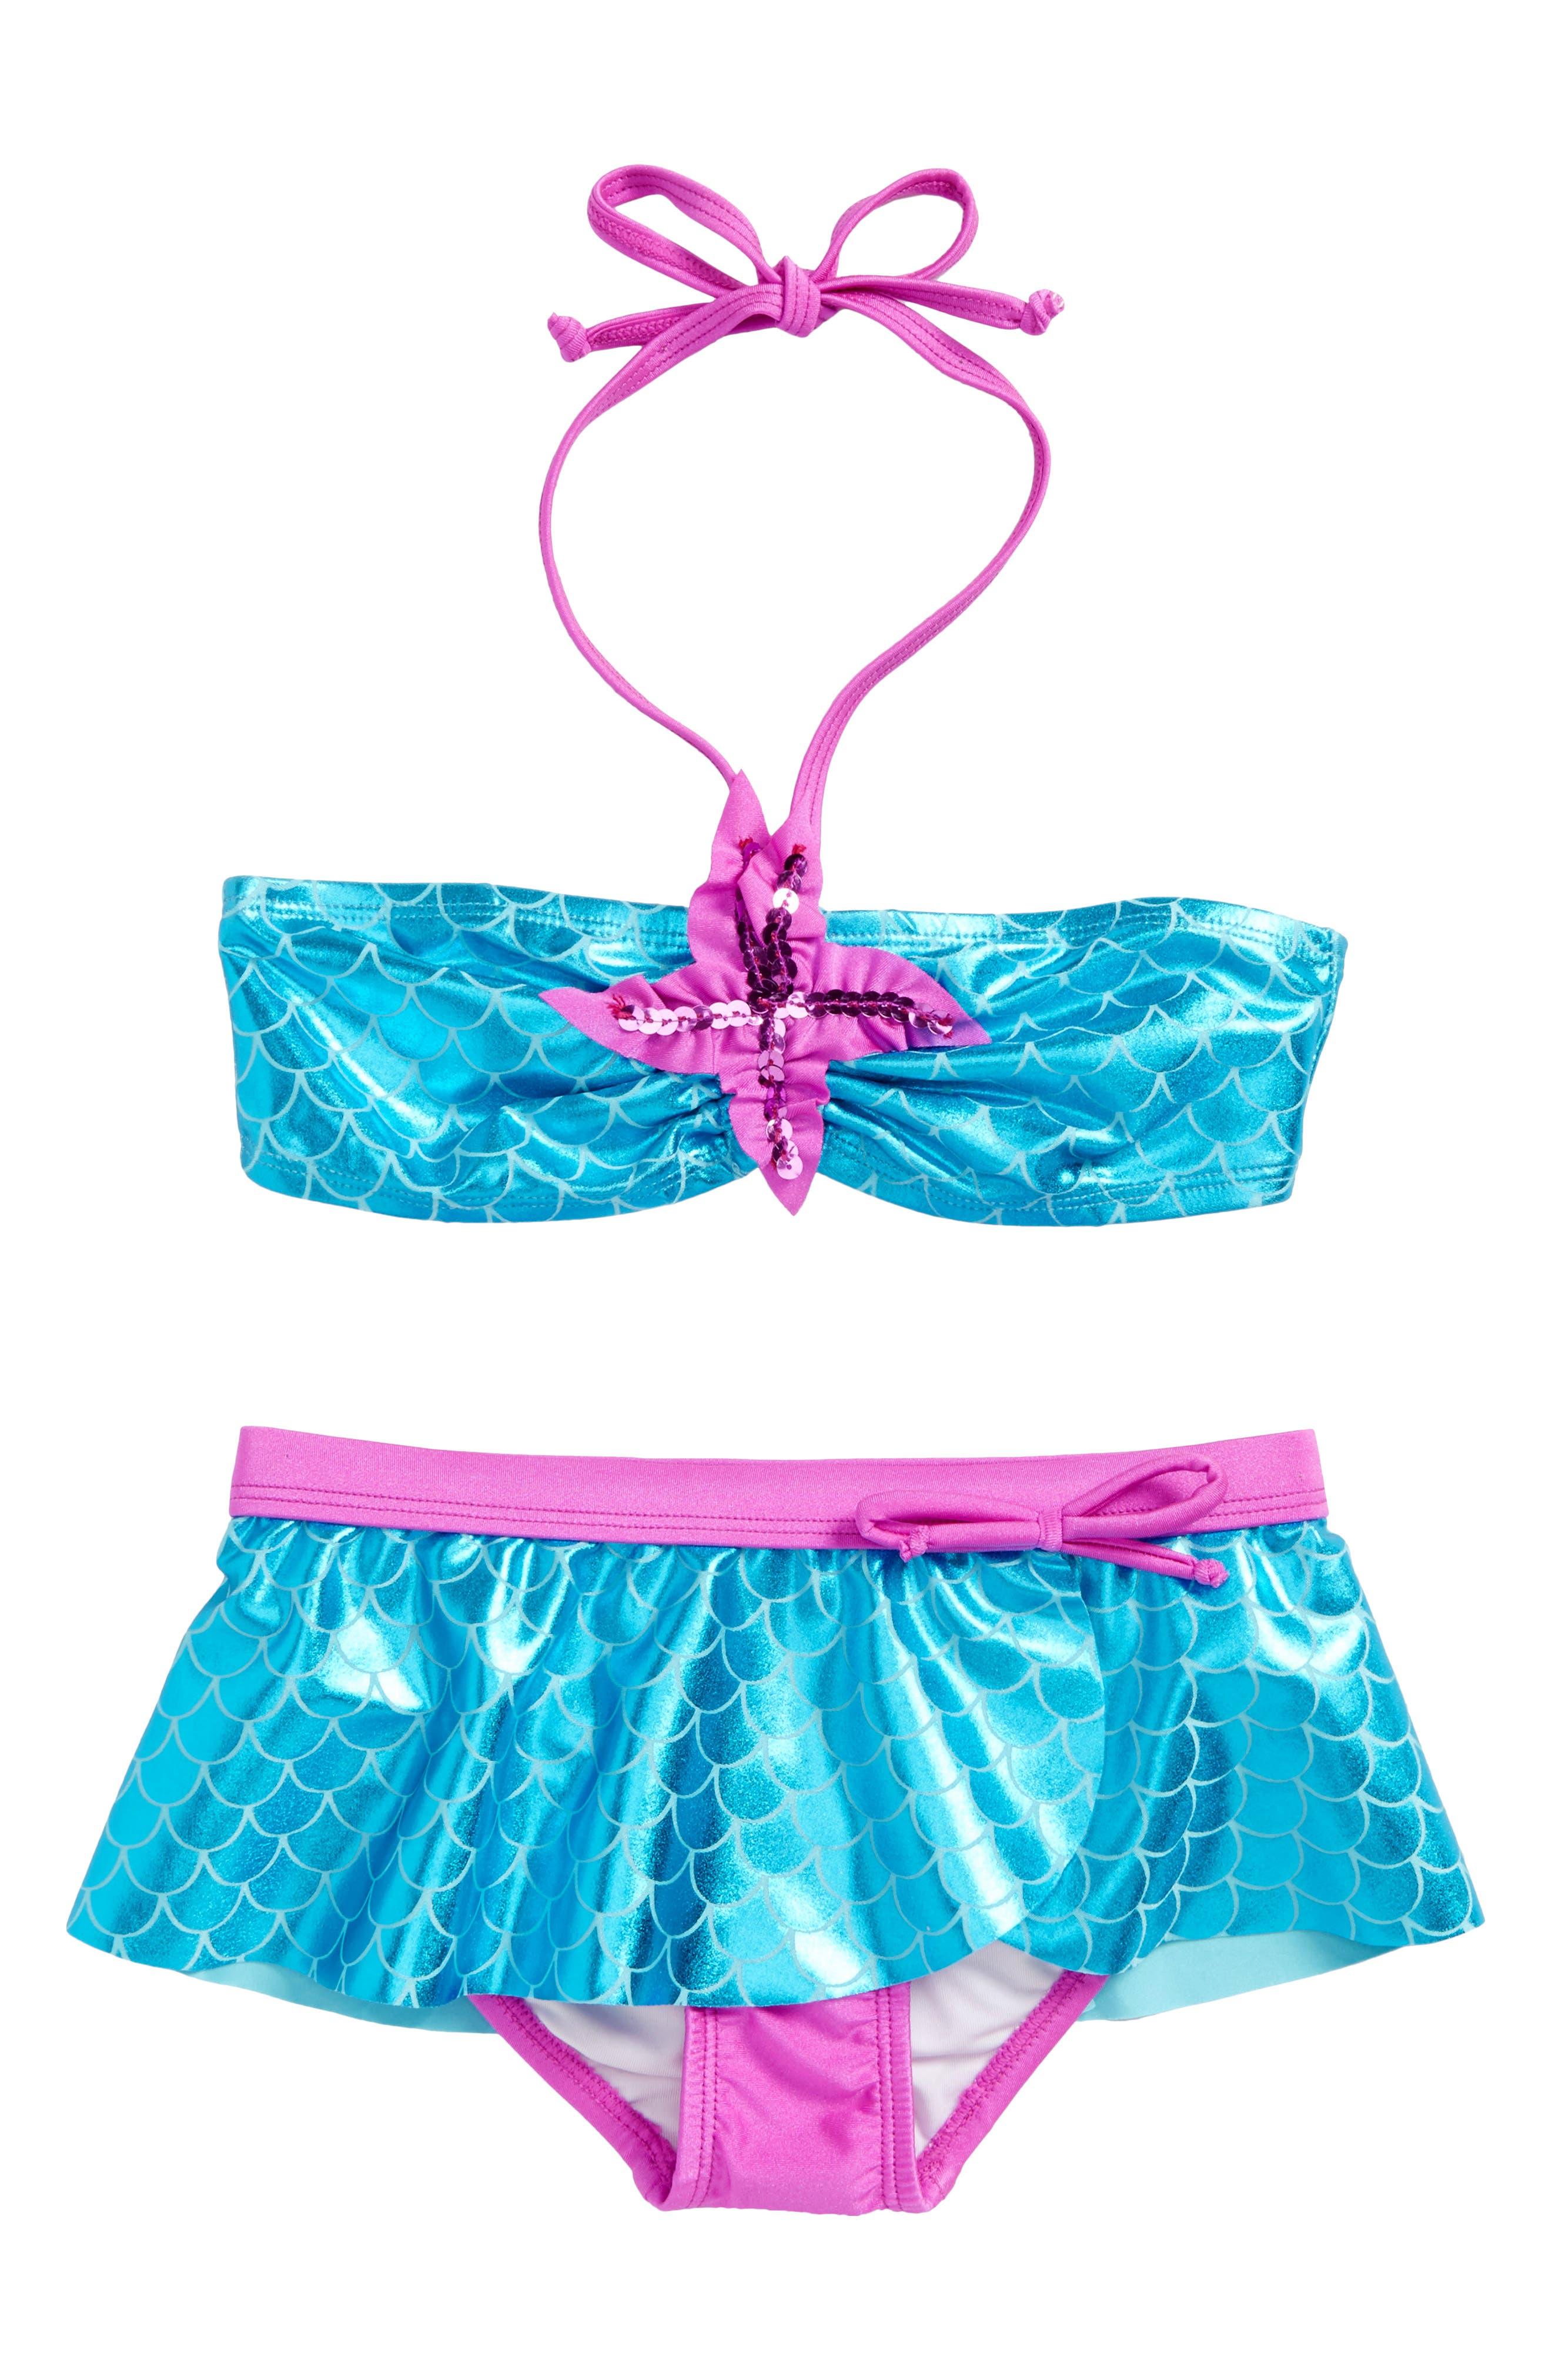 Mermaid Two-Piece Bikini Swimsuit,                             Main thumbnail 1, color,